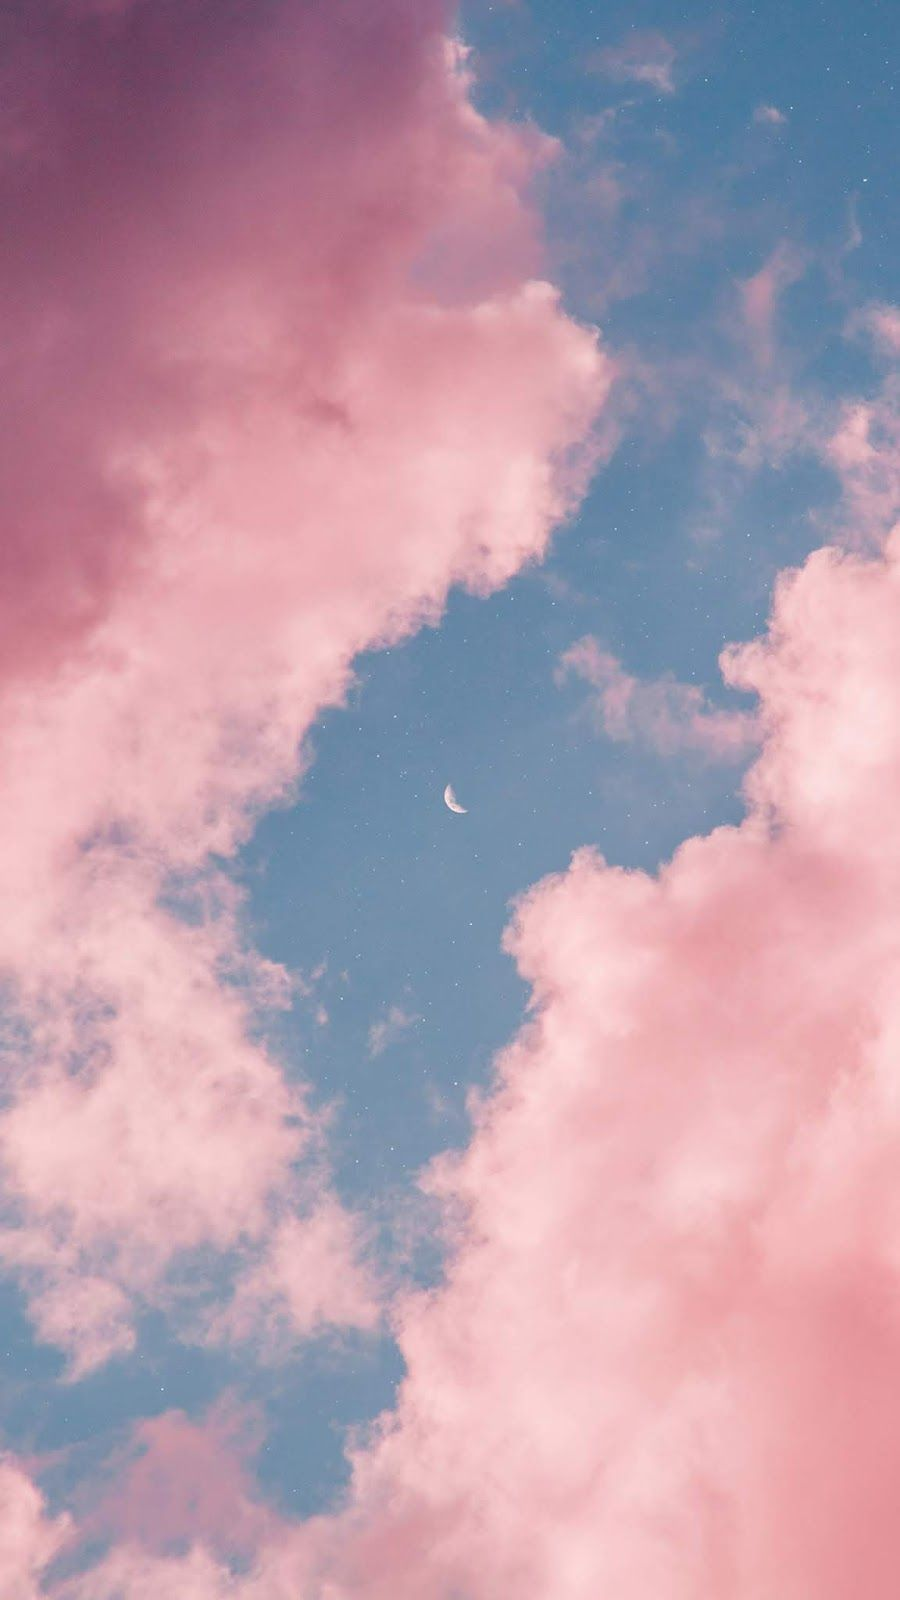 Pink Sky Night Sky Wallpaper Pink Clouds Wallpaper Sky Aesthetic